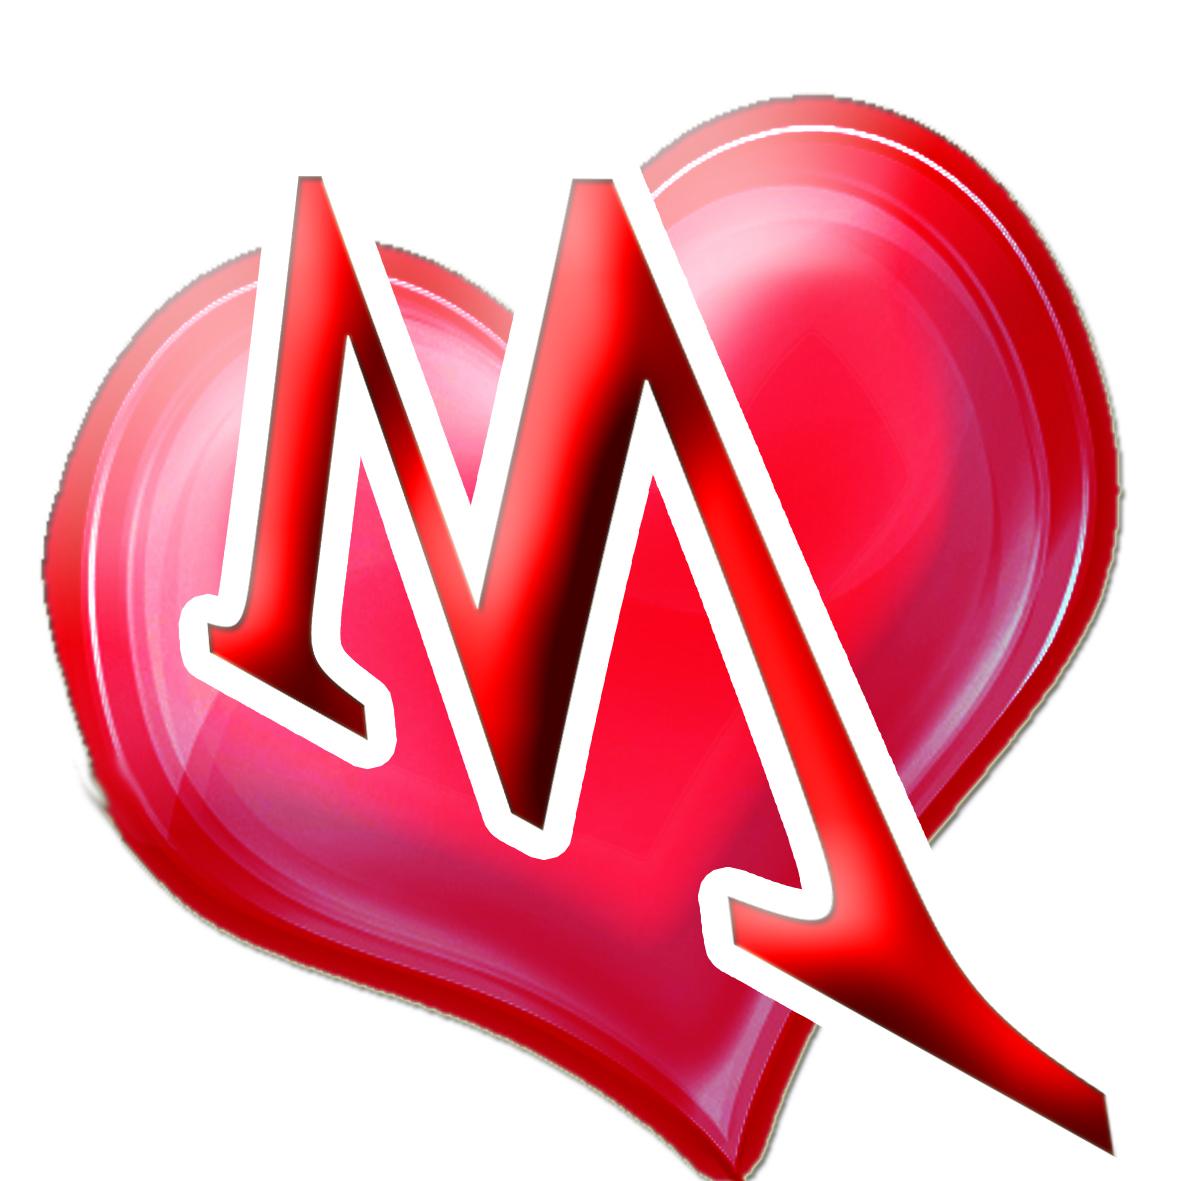 صورة صور حرف m , لكل محبي حرف m حملوا اجمد خلفيات 👇 6400 6